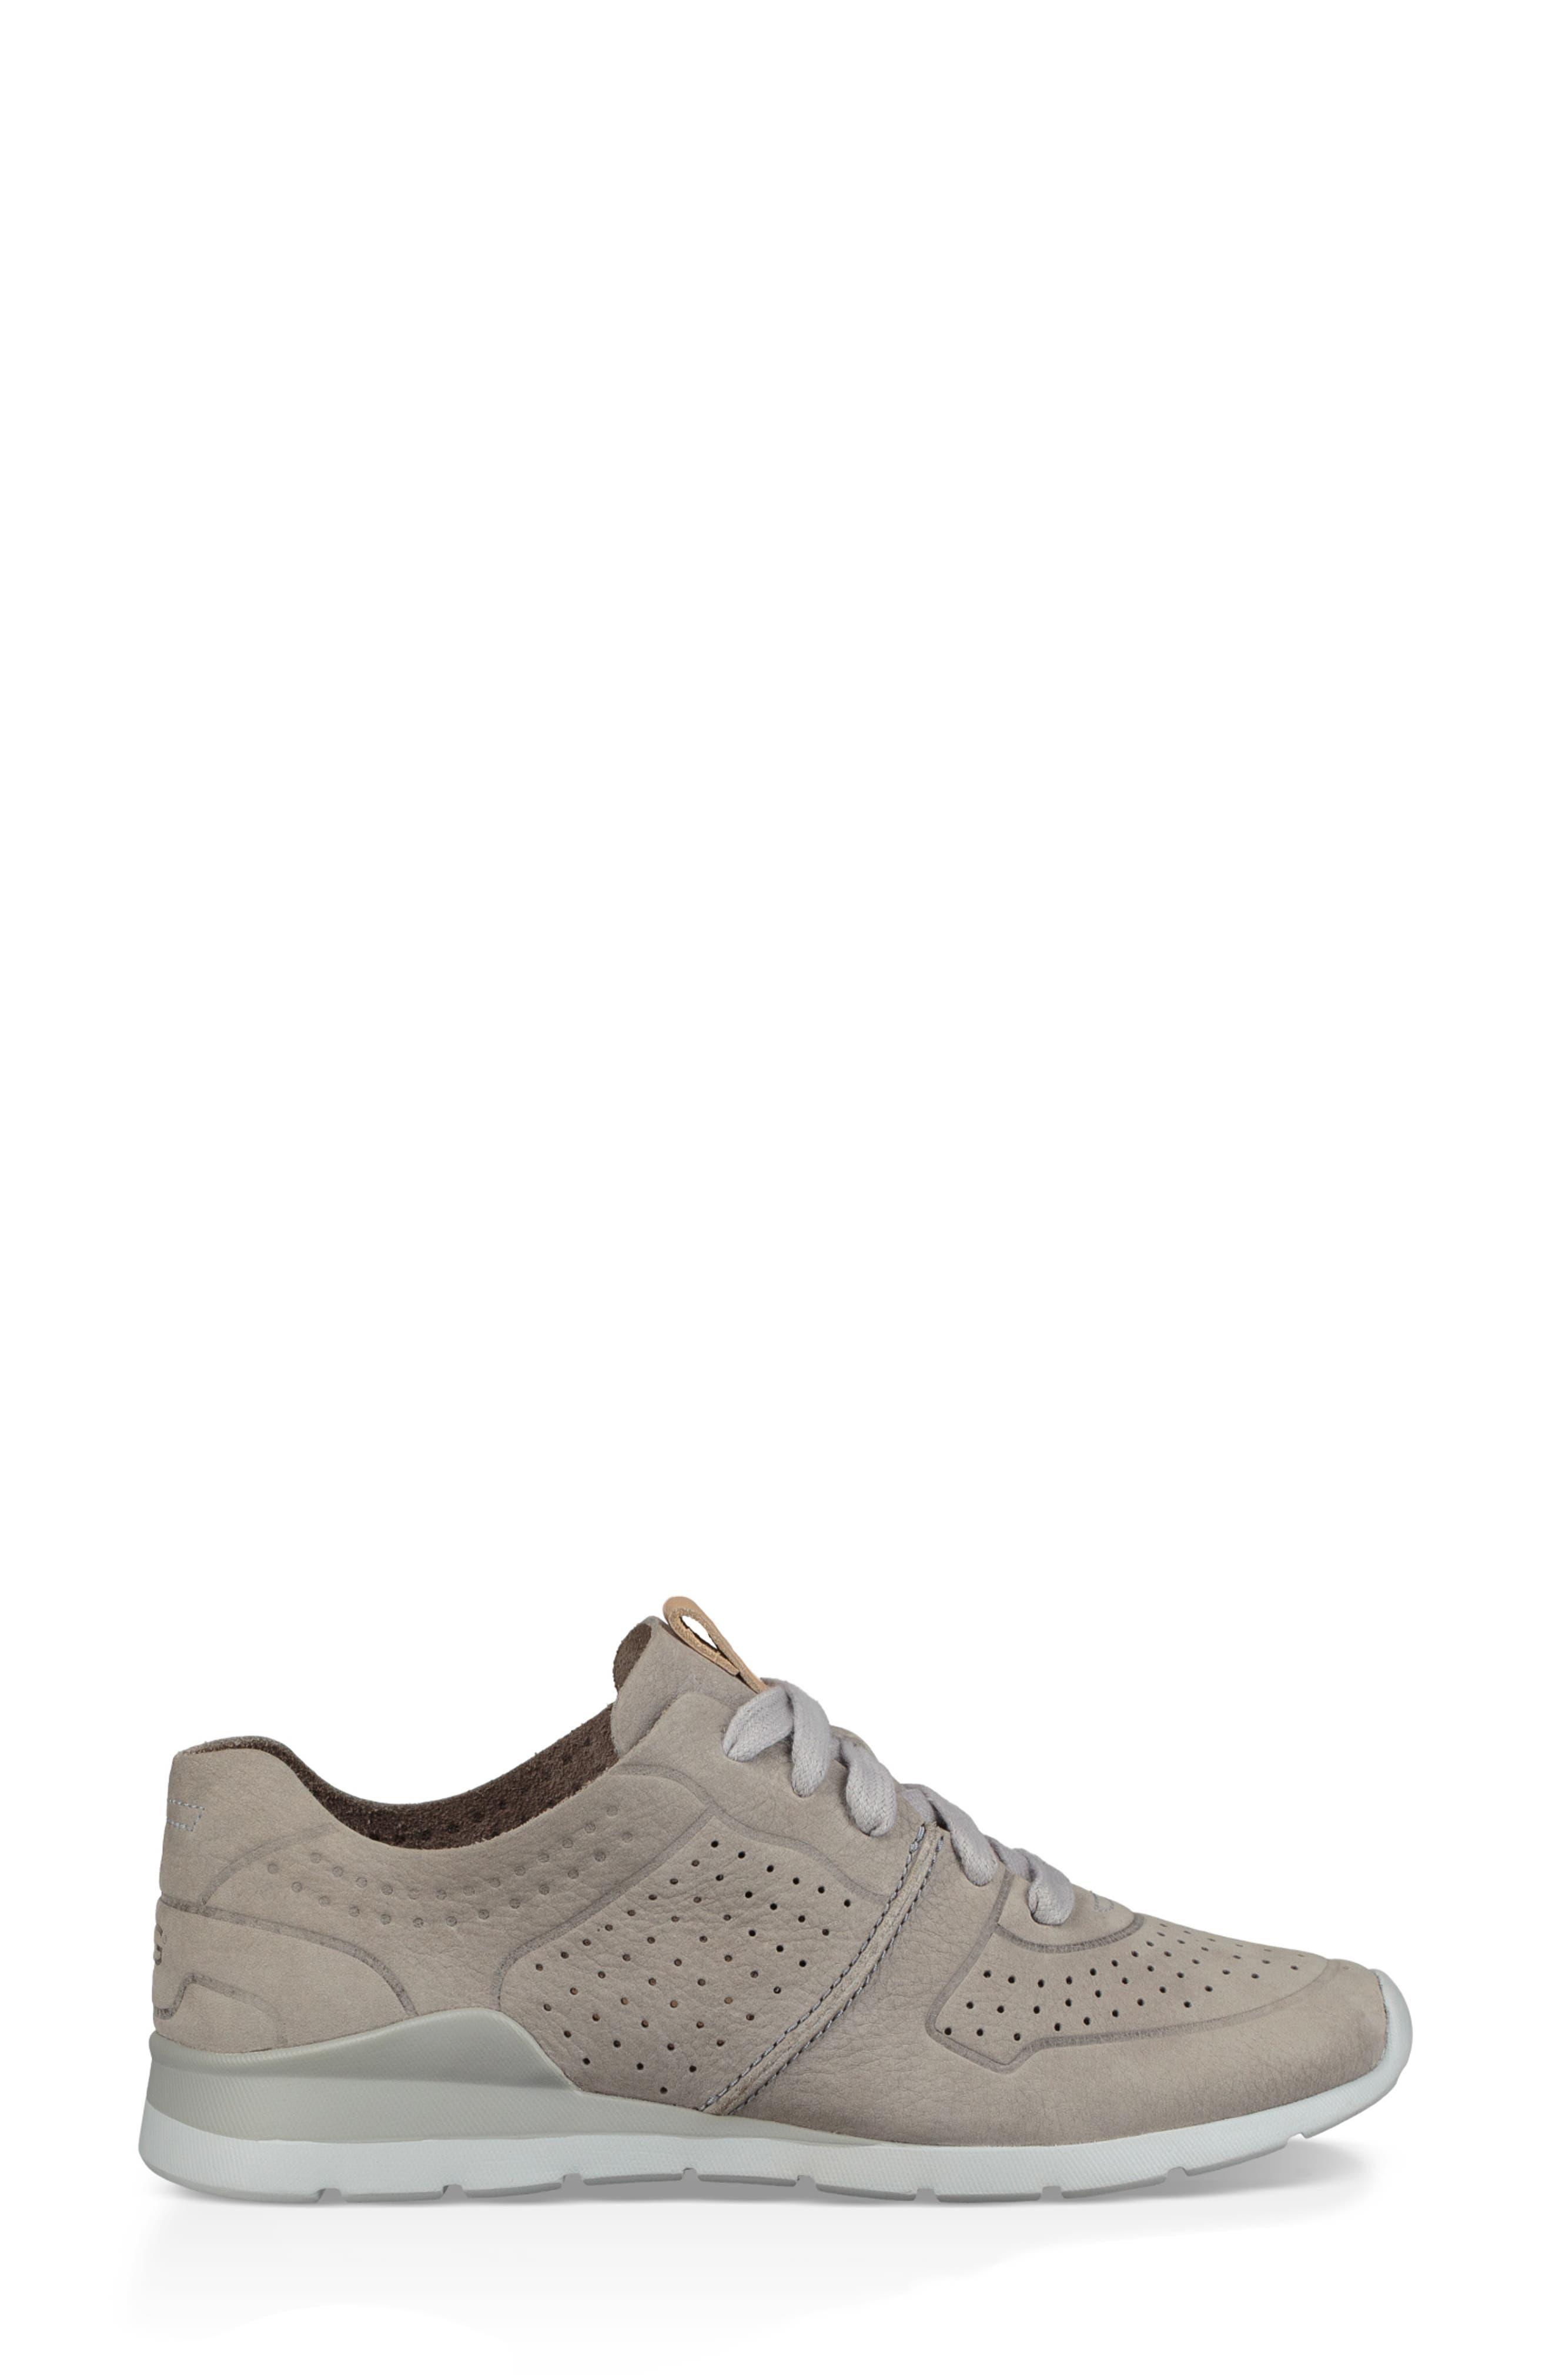 UGG<SUP>®</SUP>, Tye Sneaker, Alternate thumbnail 3, color, 024